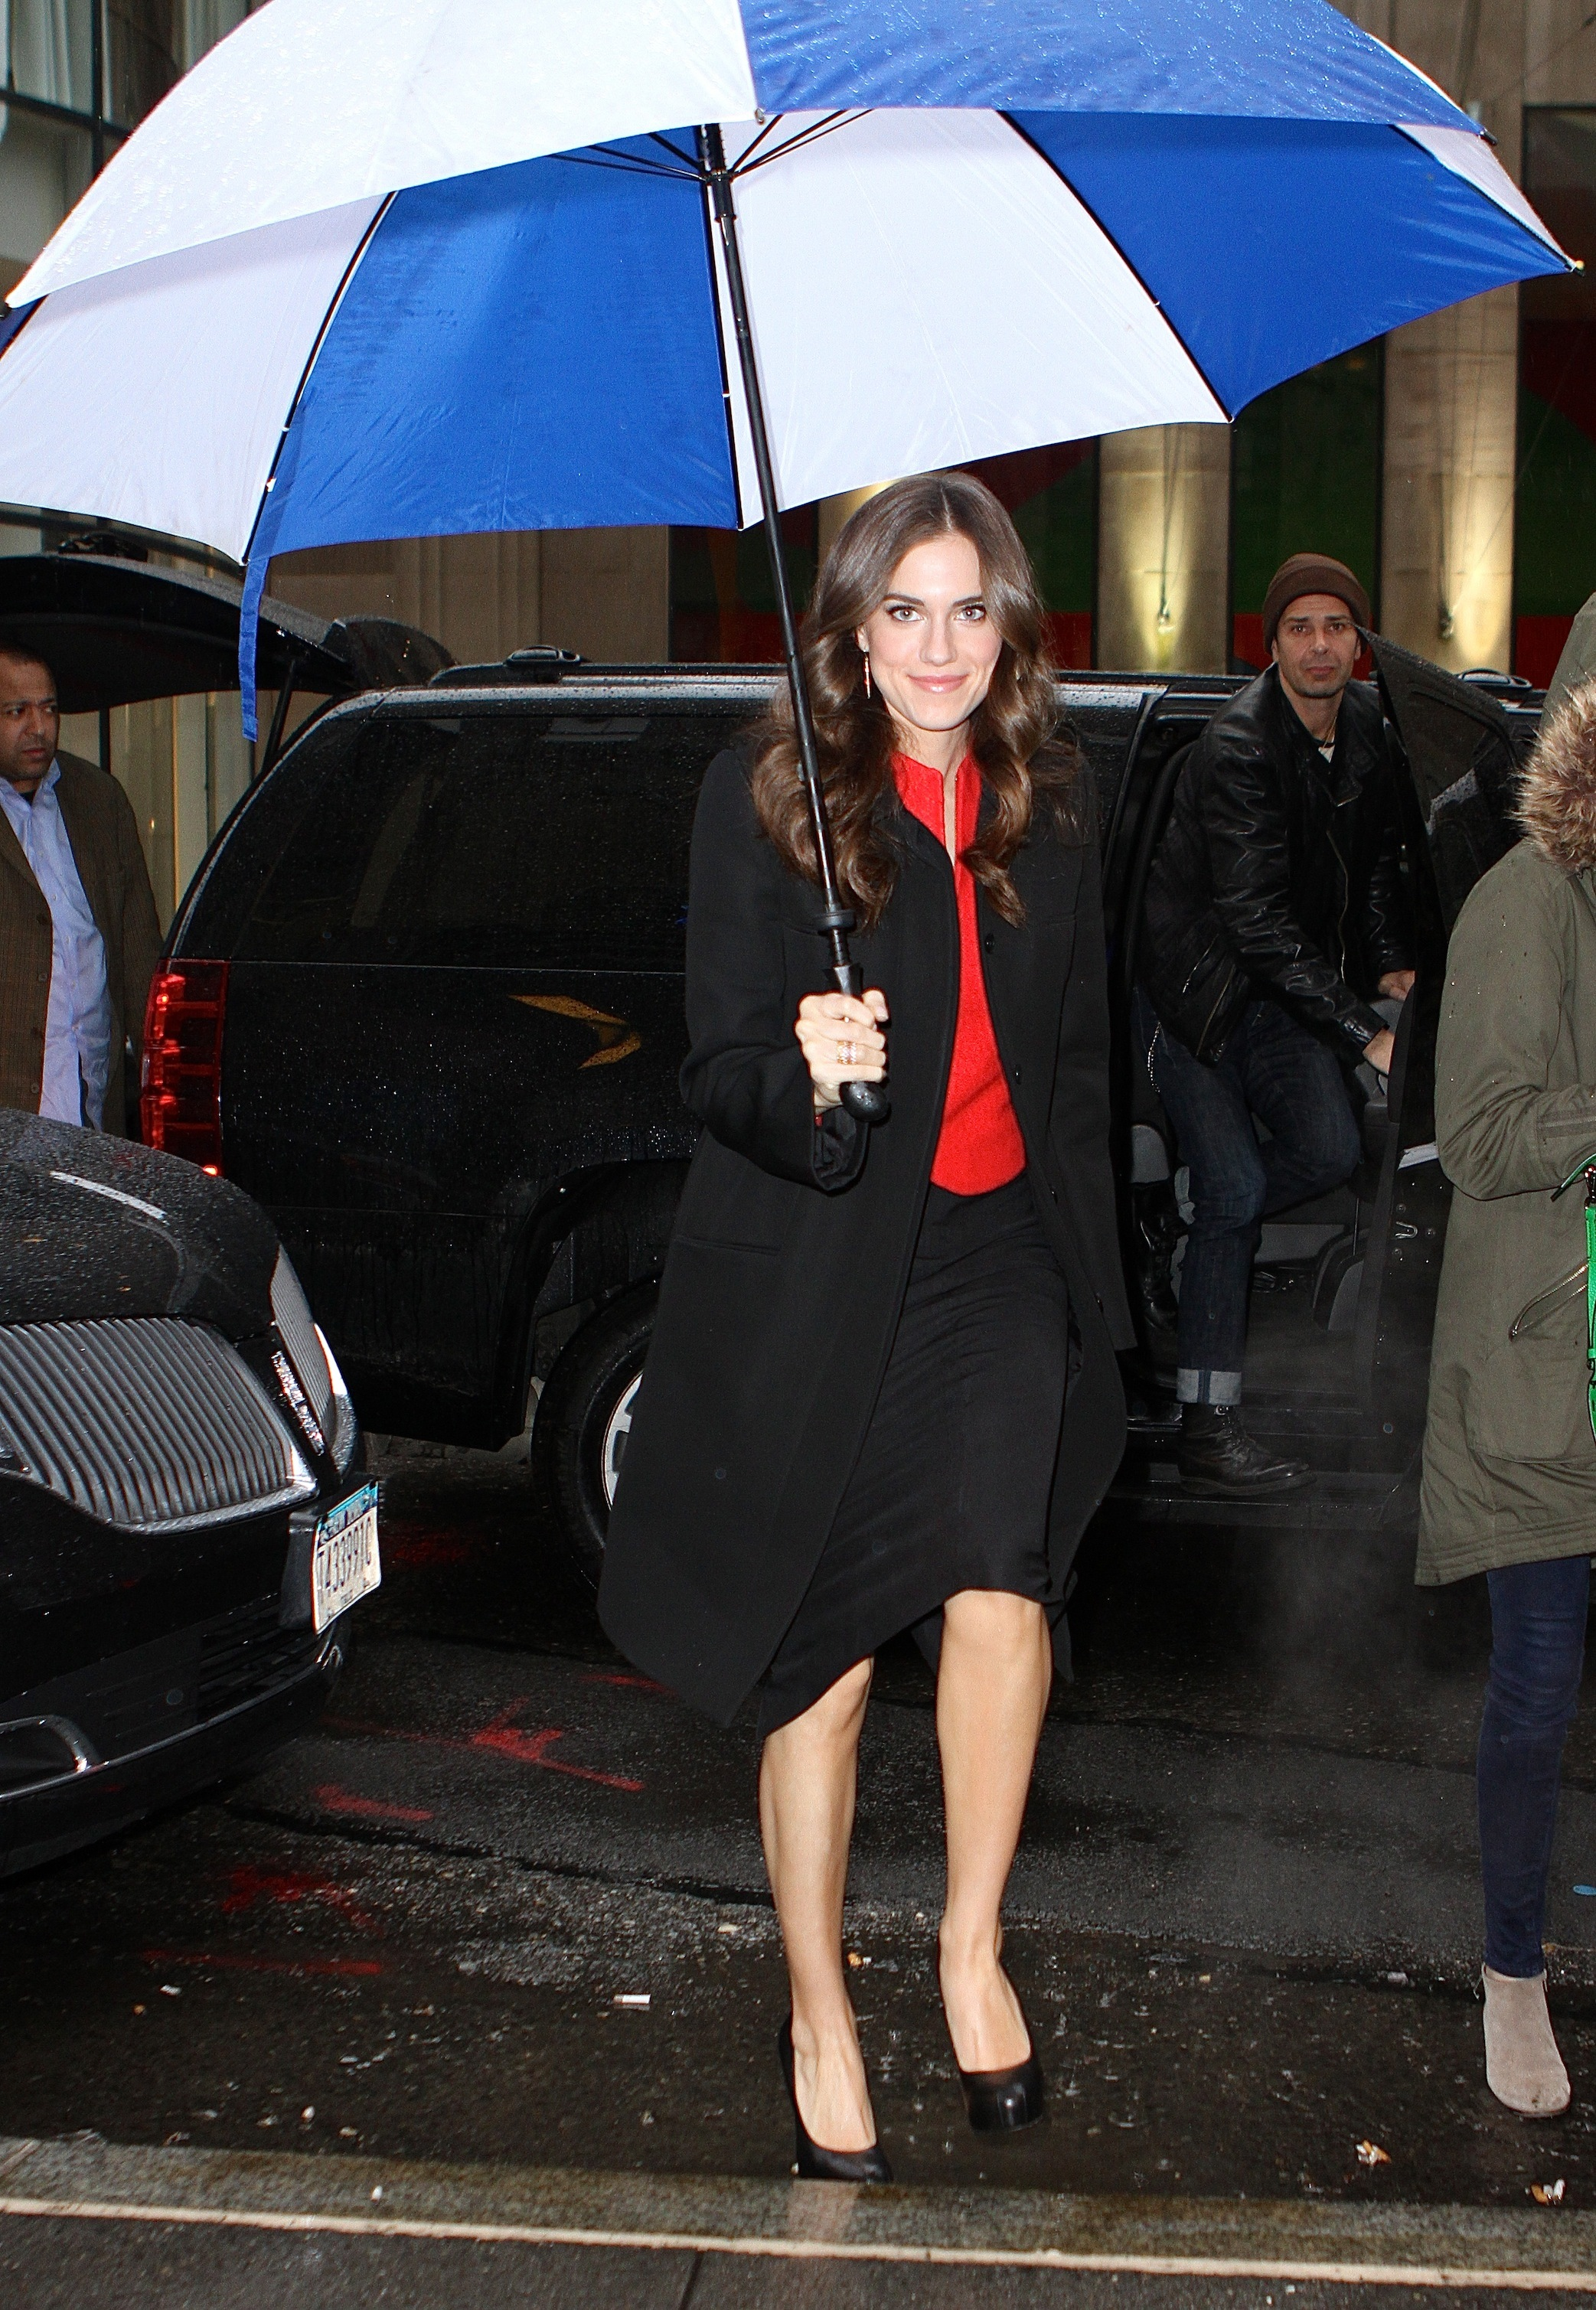 Allison williams Girls blue and white umbrella